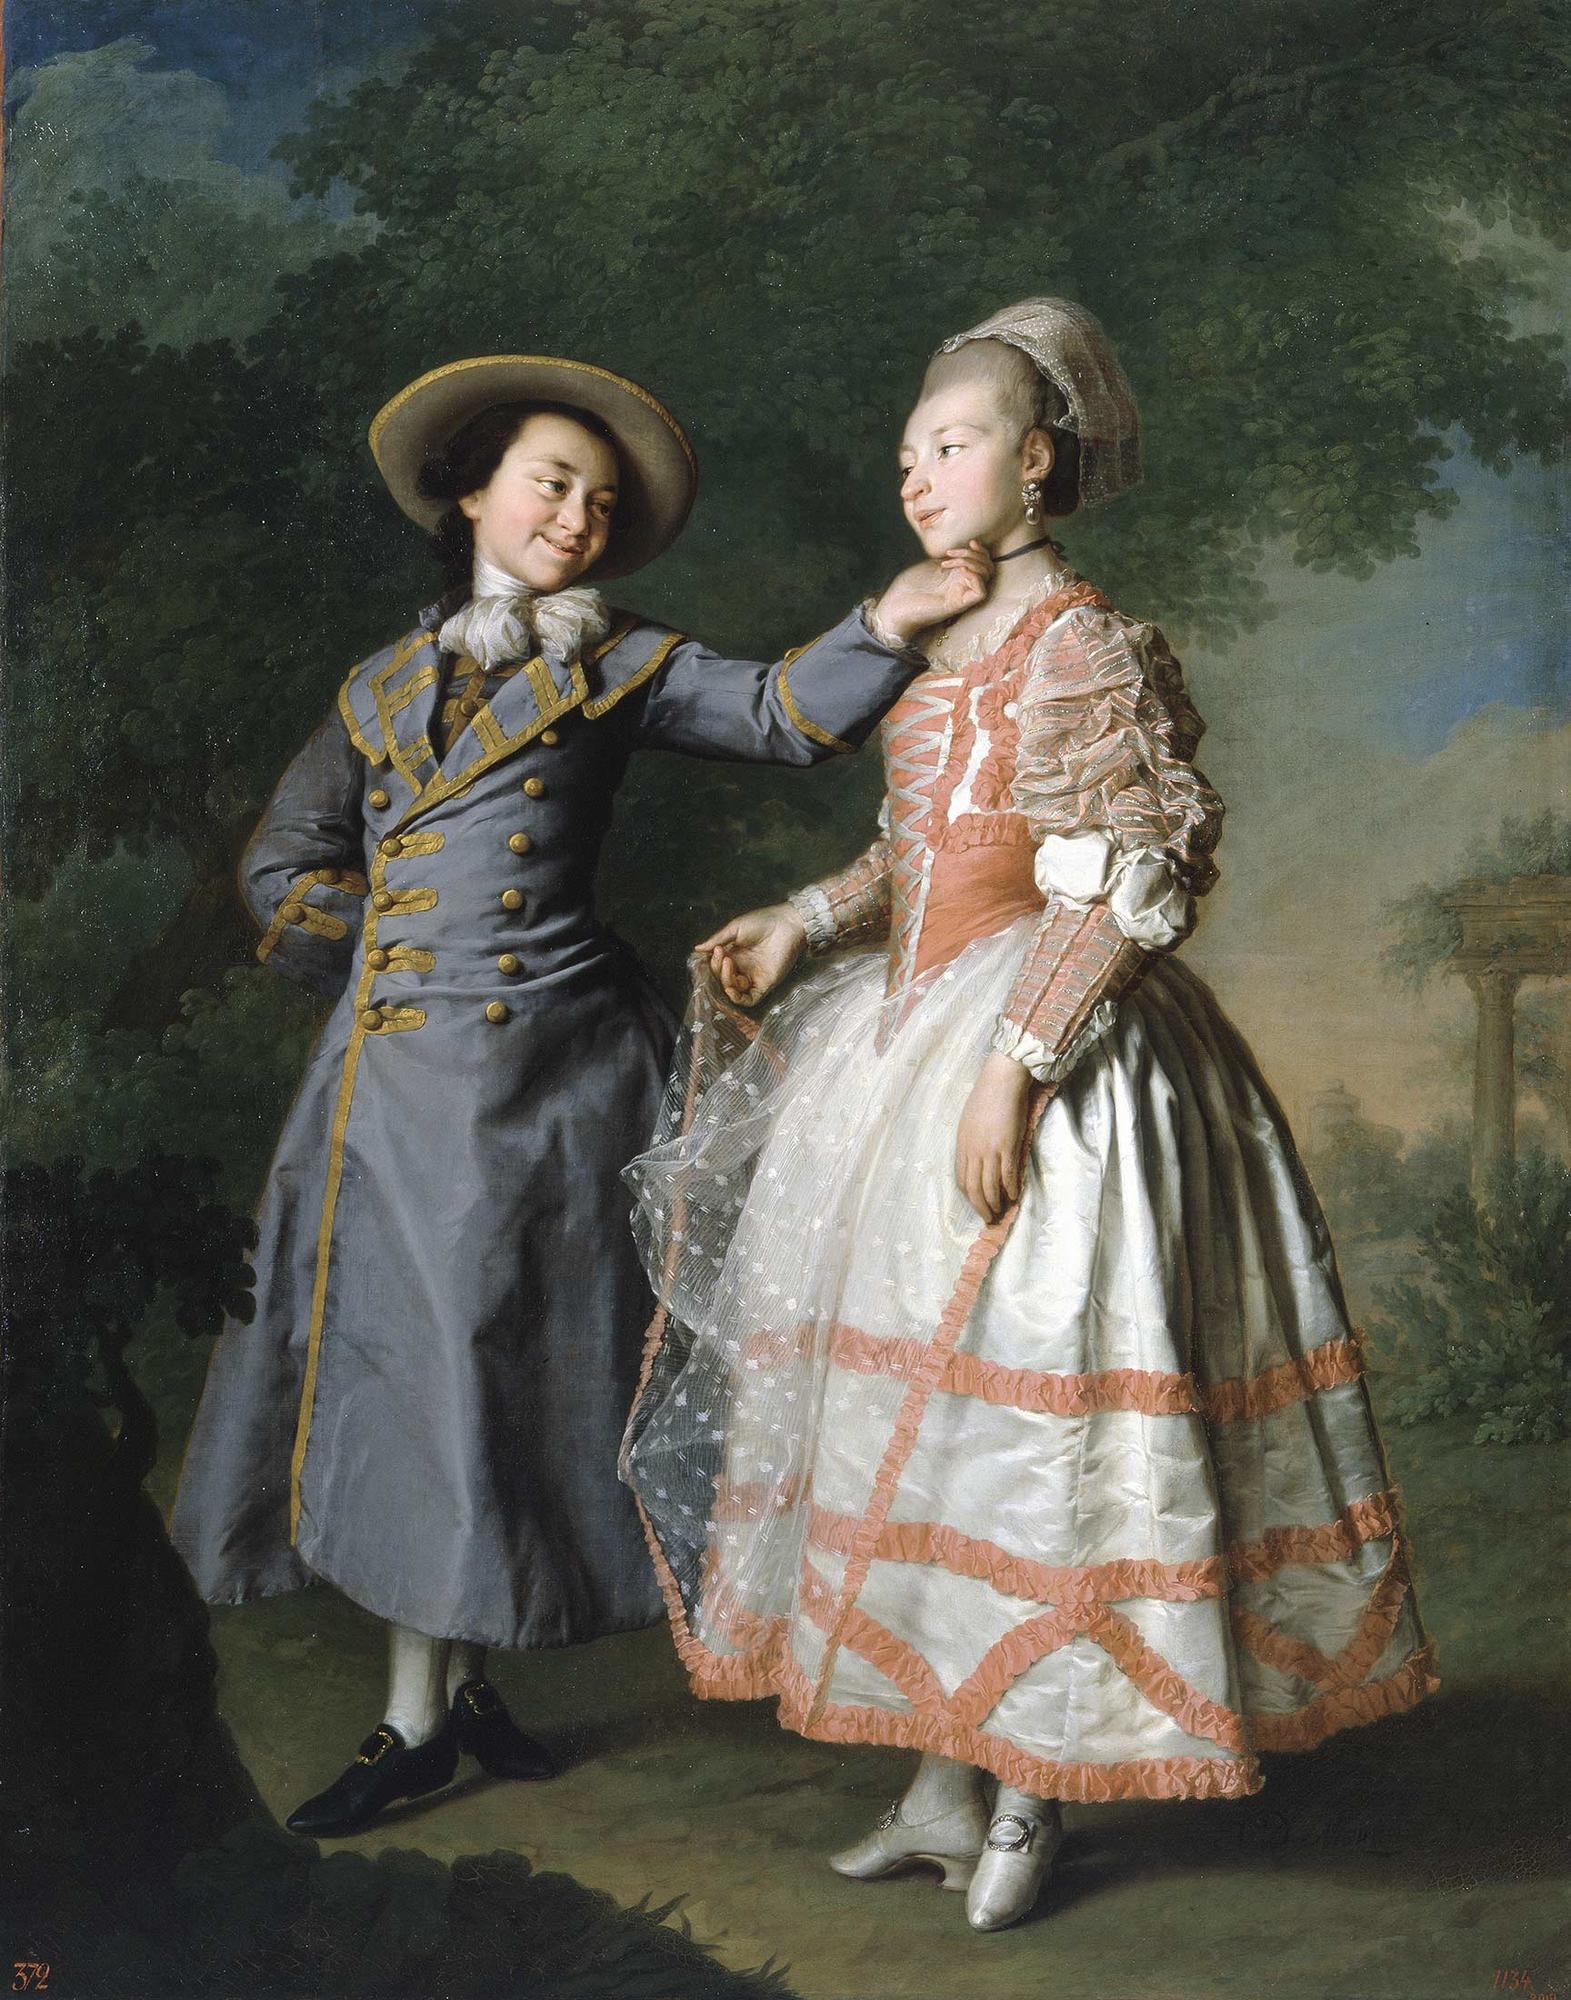 Dmitry Levitsky, Portrait of Ekaterina Khruscheva and Ekaterina Khovanskaya, circa 1773, Russian museum, St. Petersburg, Russia.